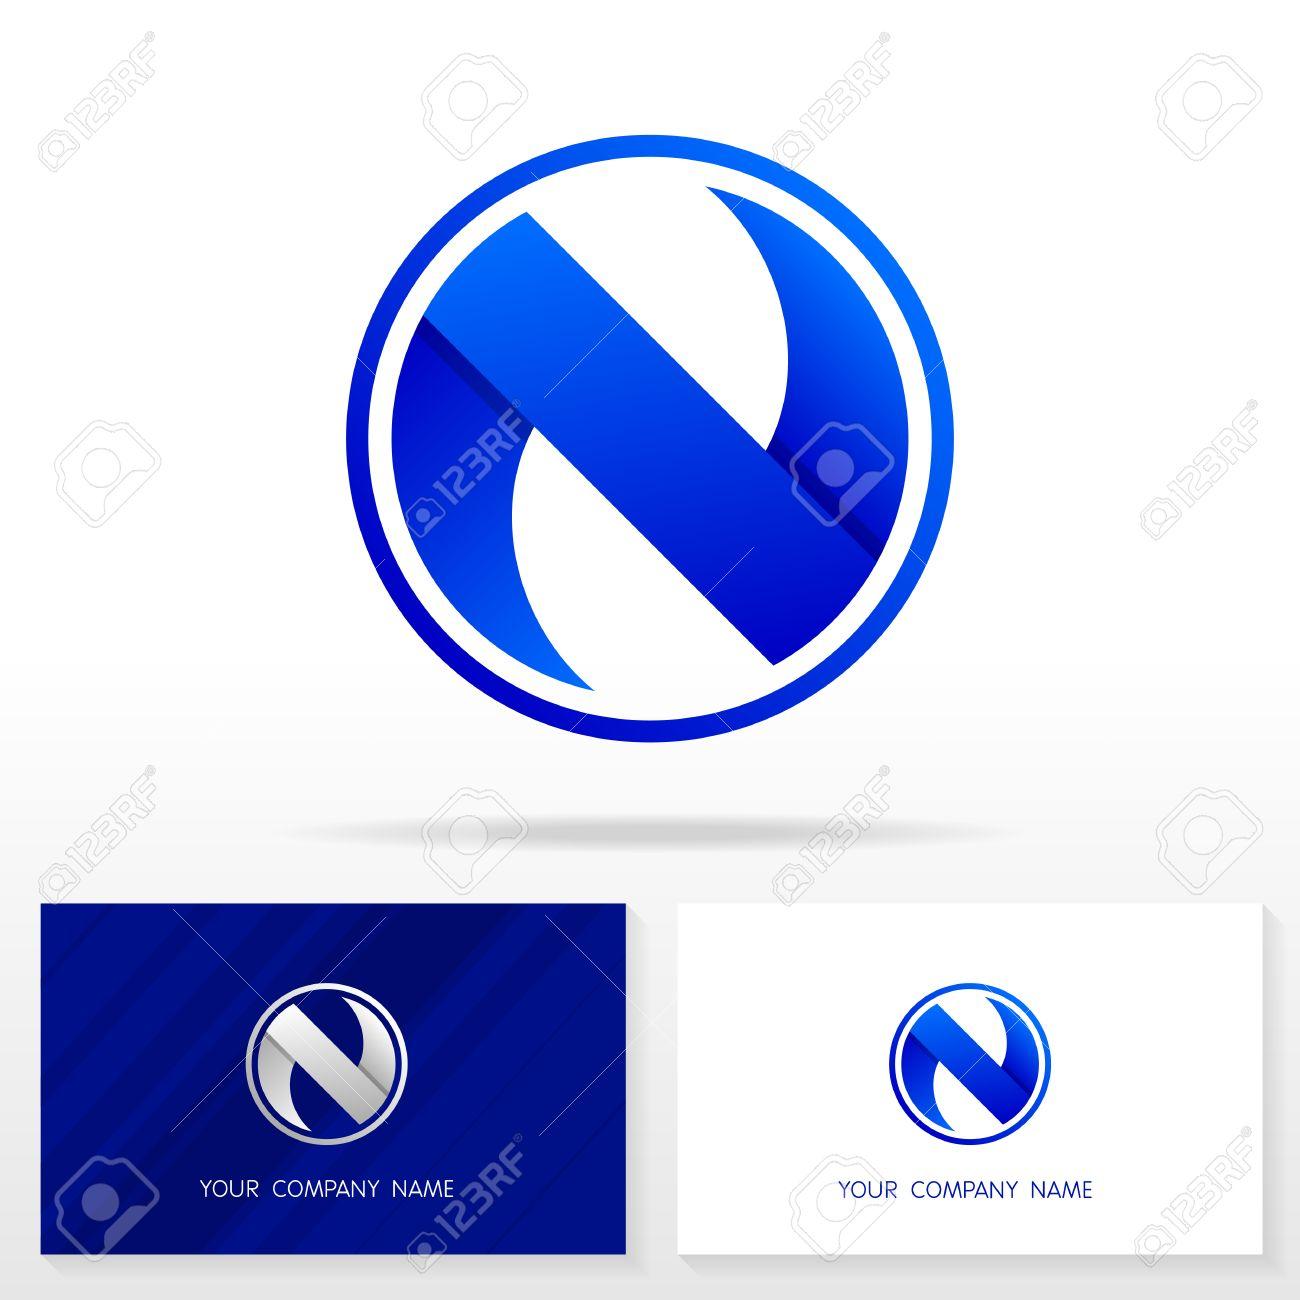 letter n logo design business vector sign business card templates